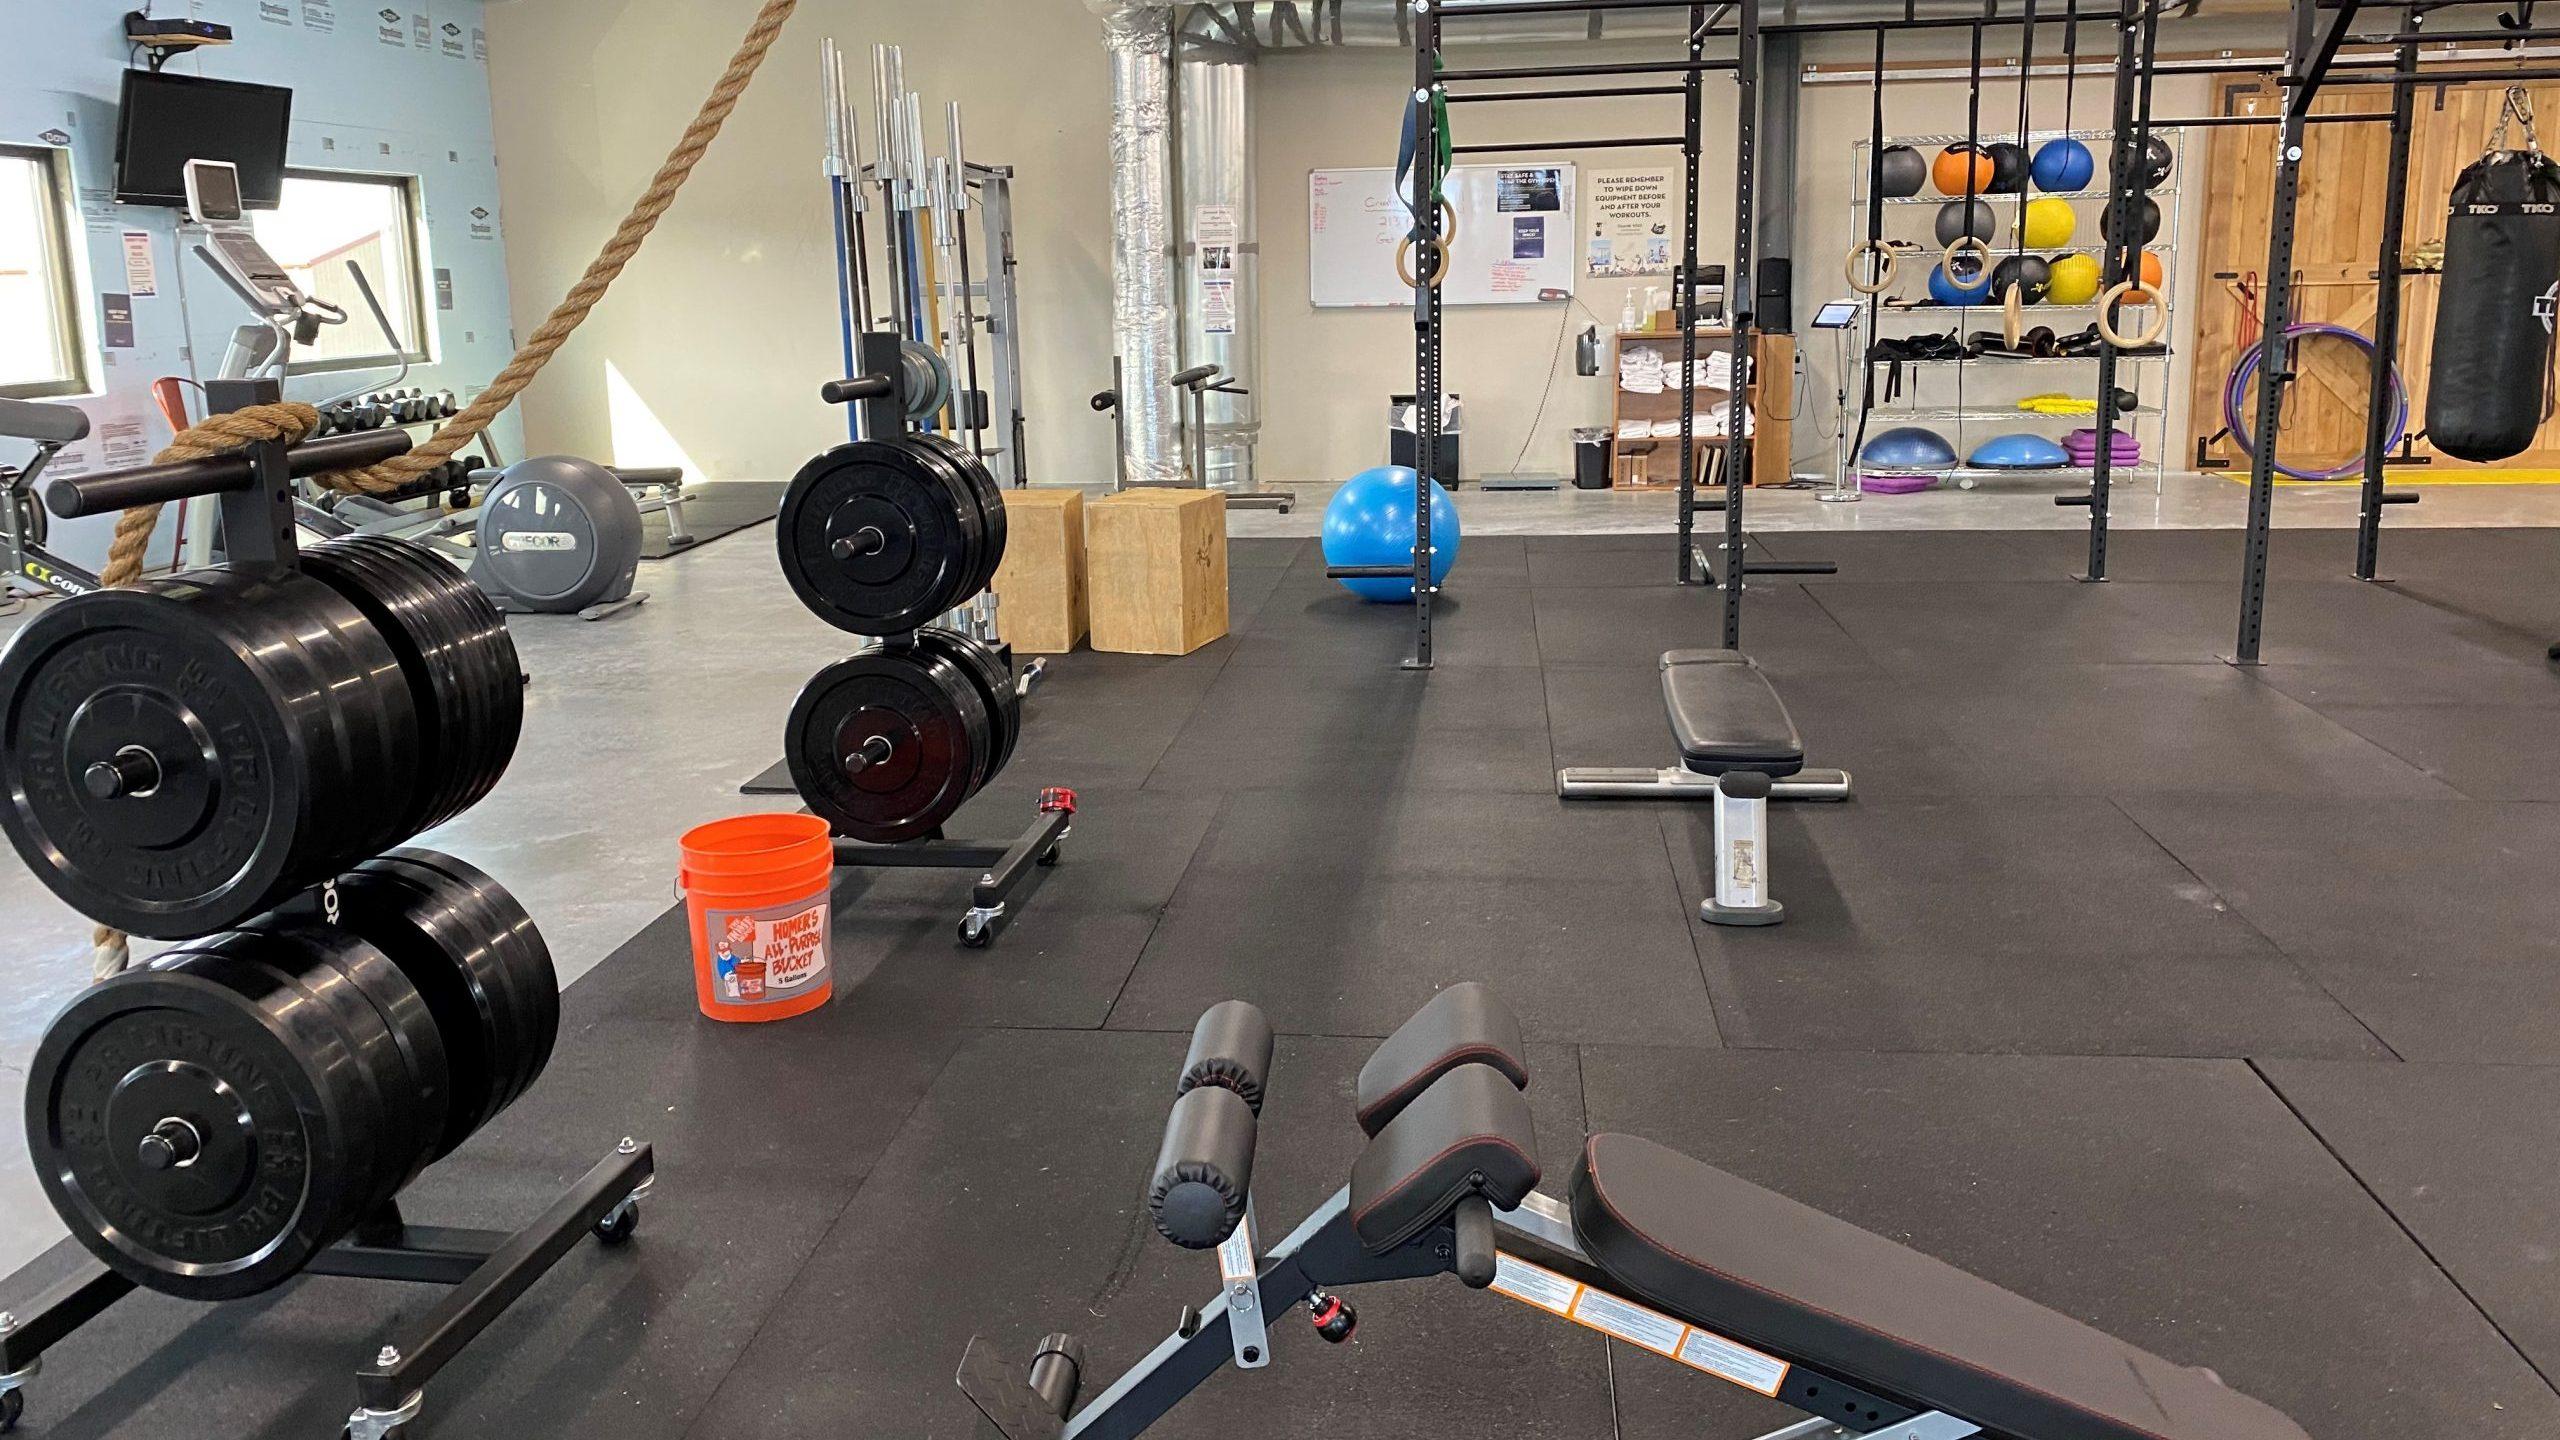 Swin Gym